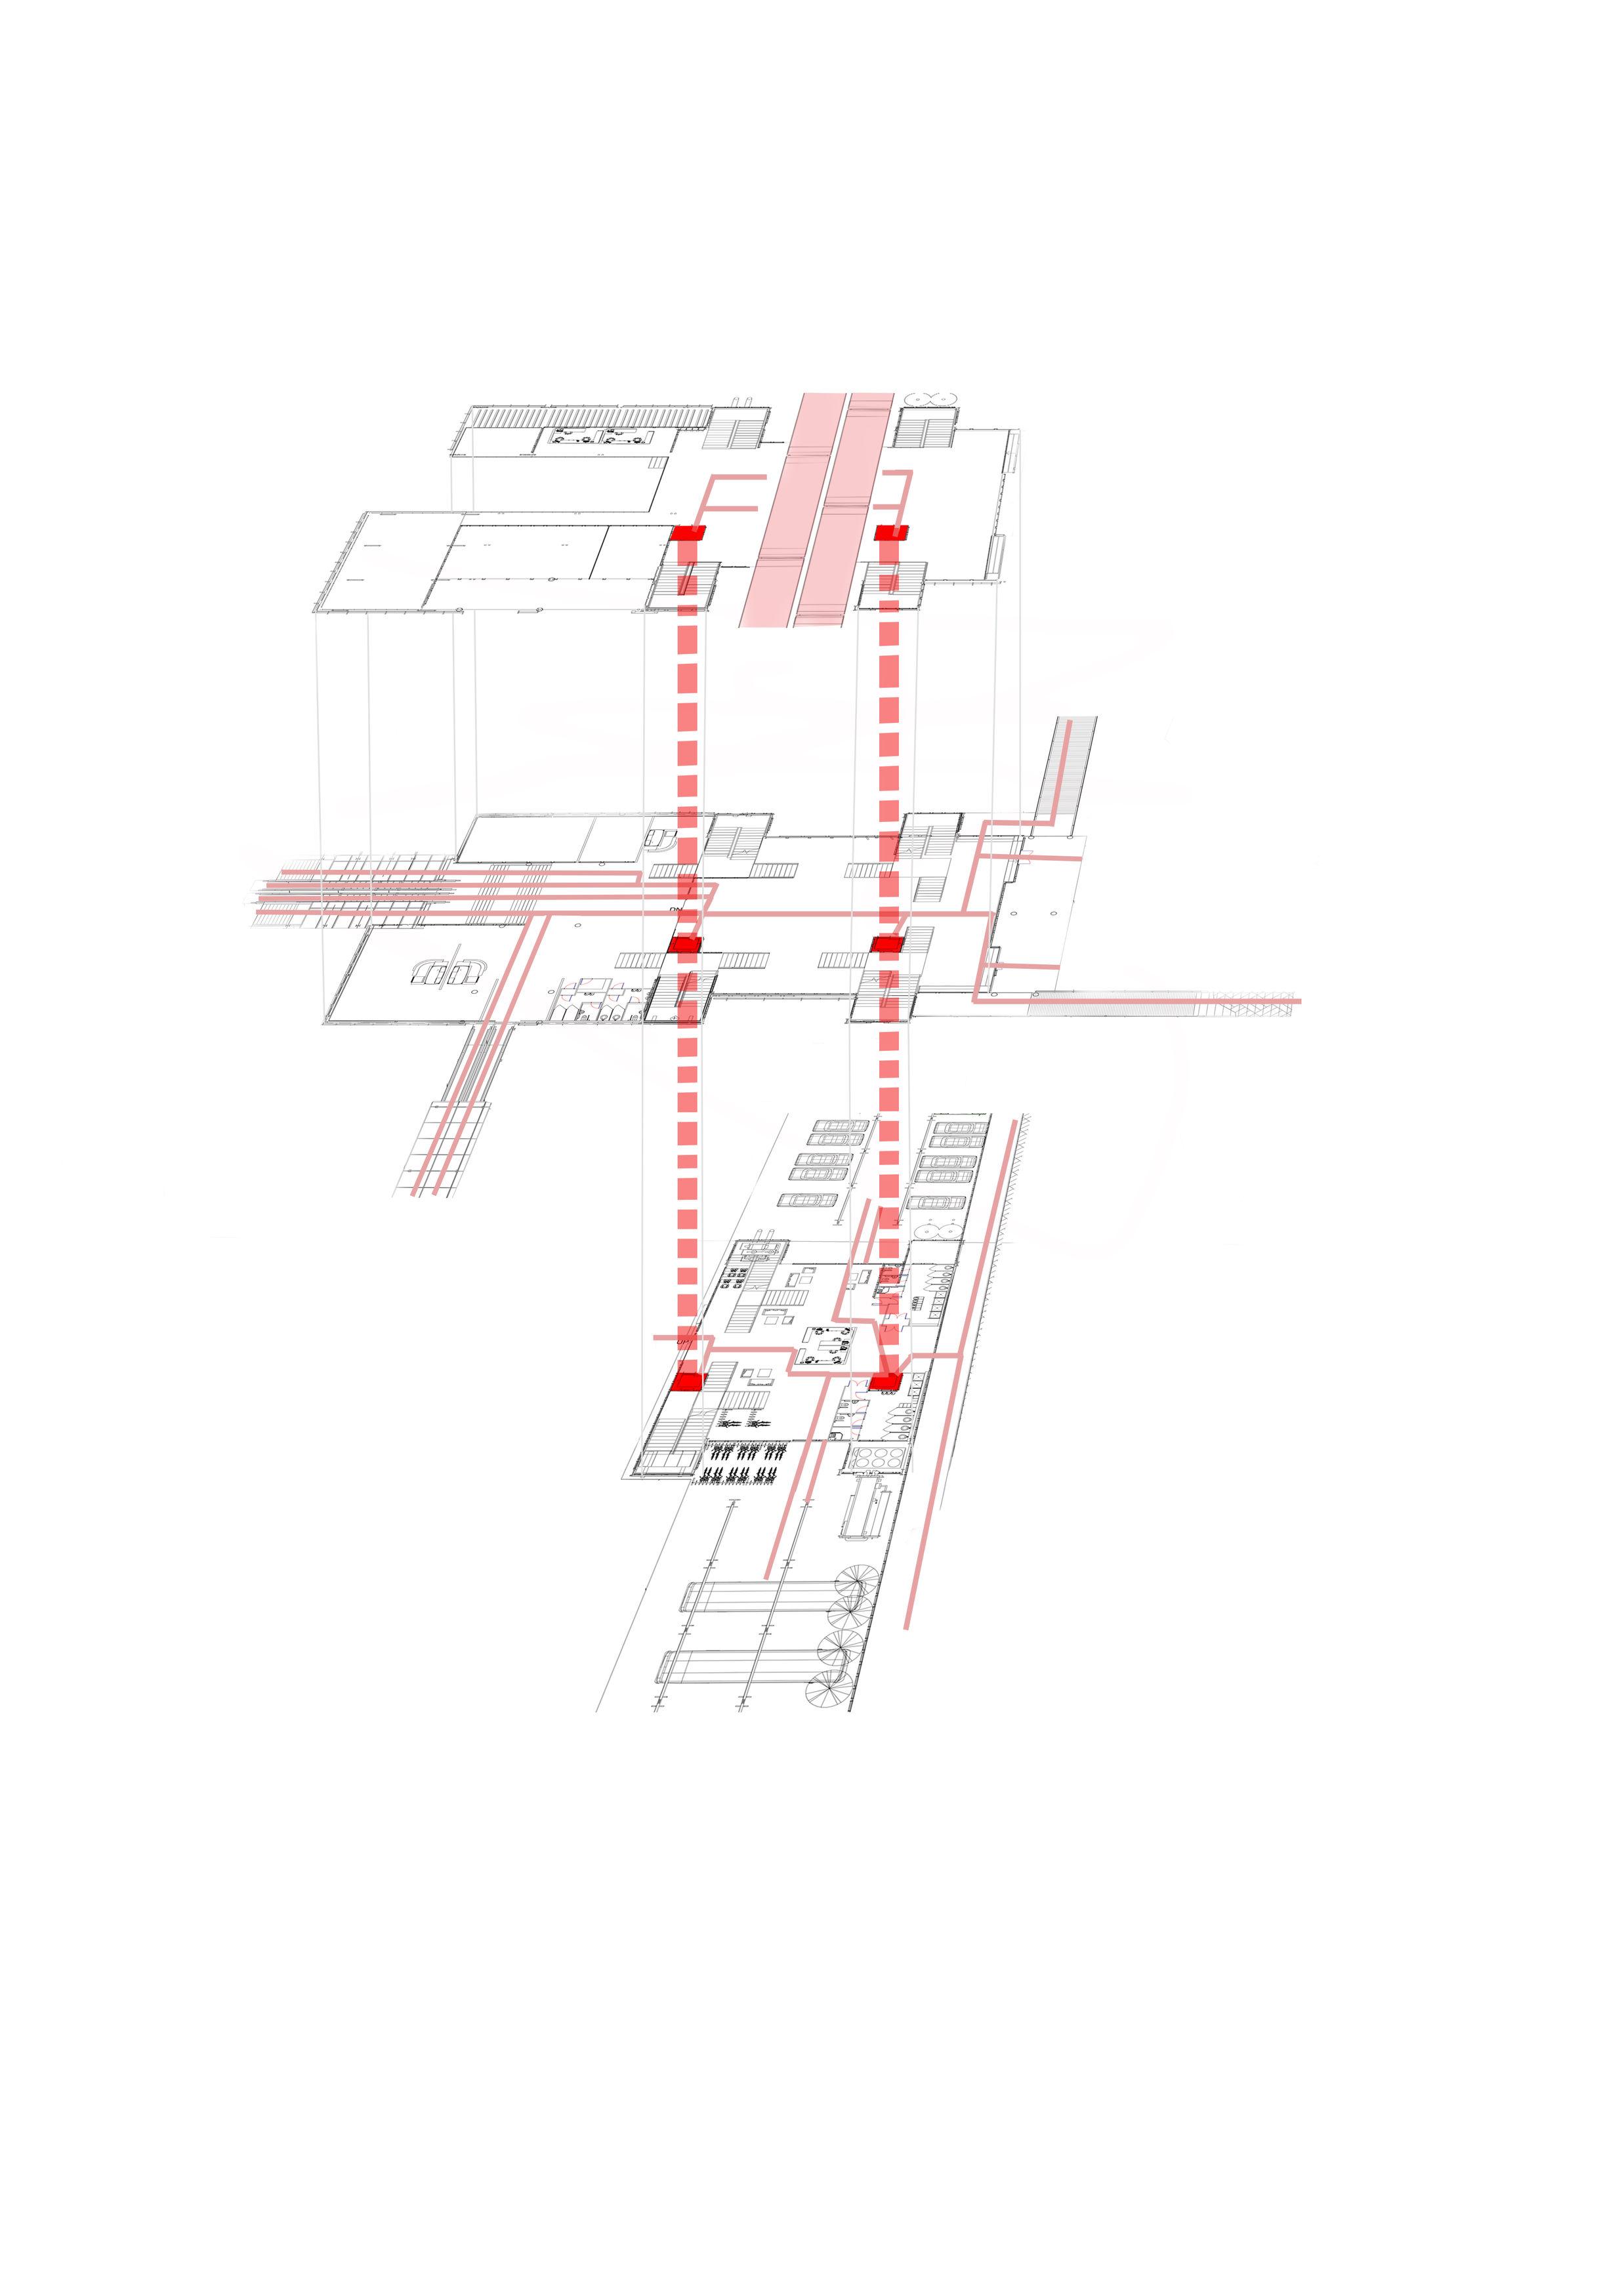 Elevator-circulation-3500-3500